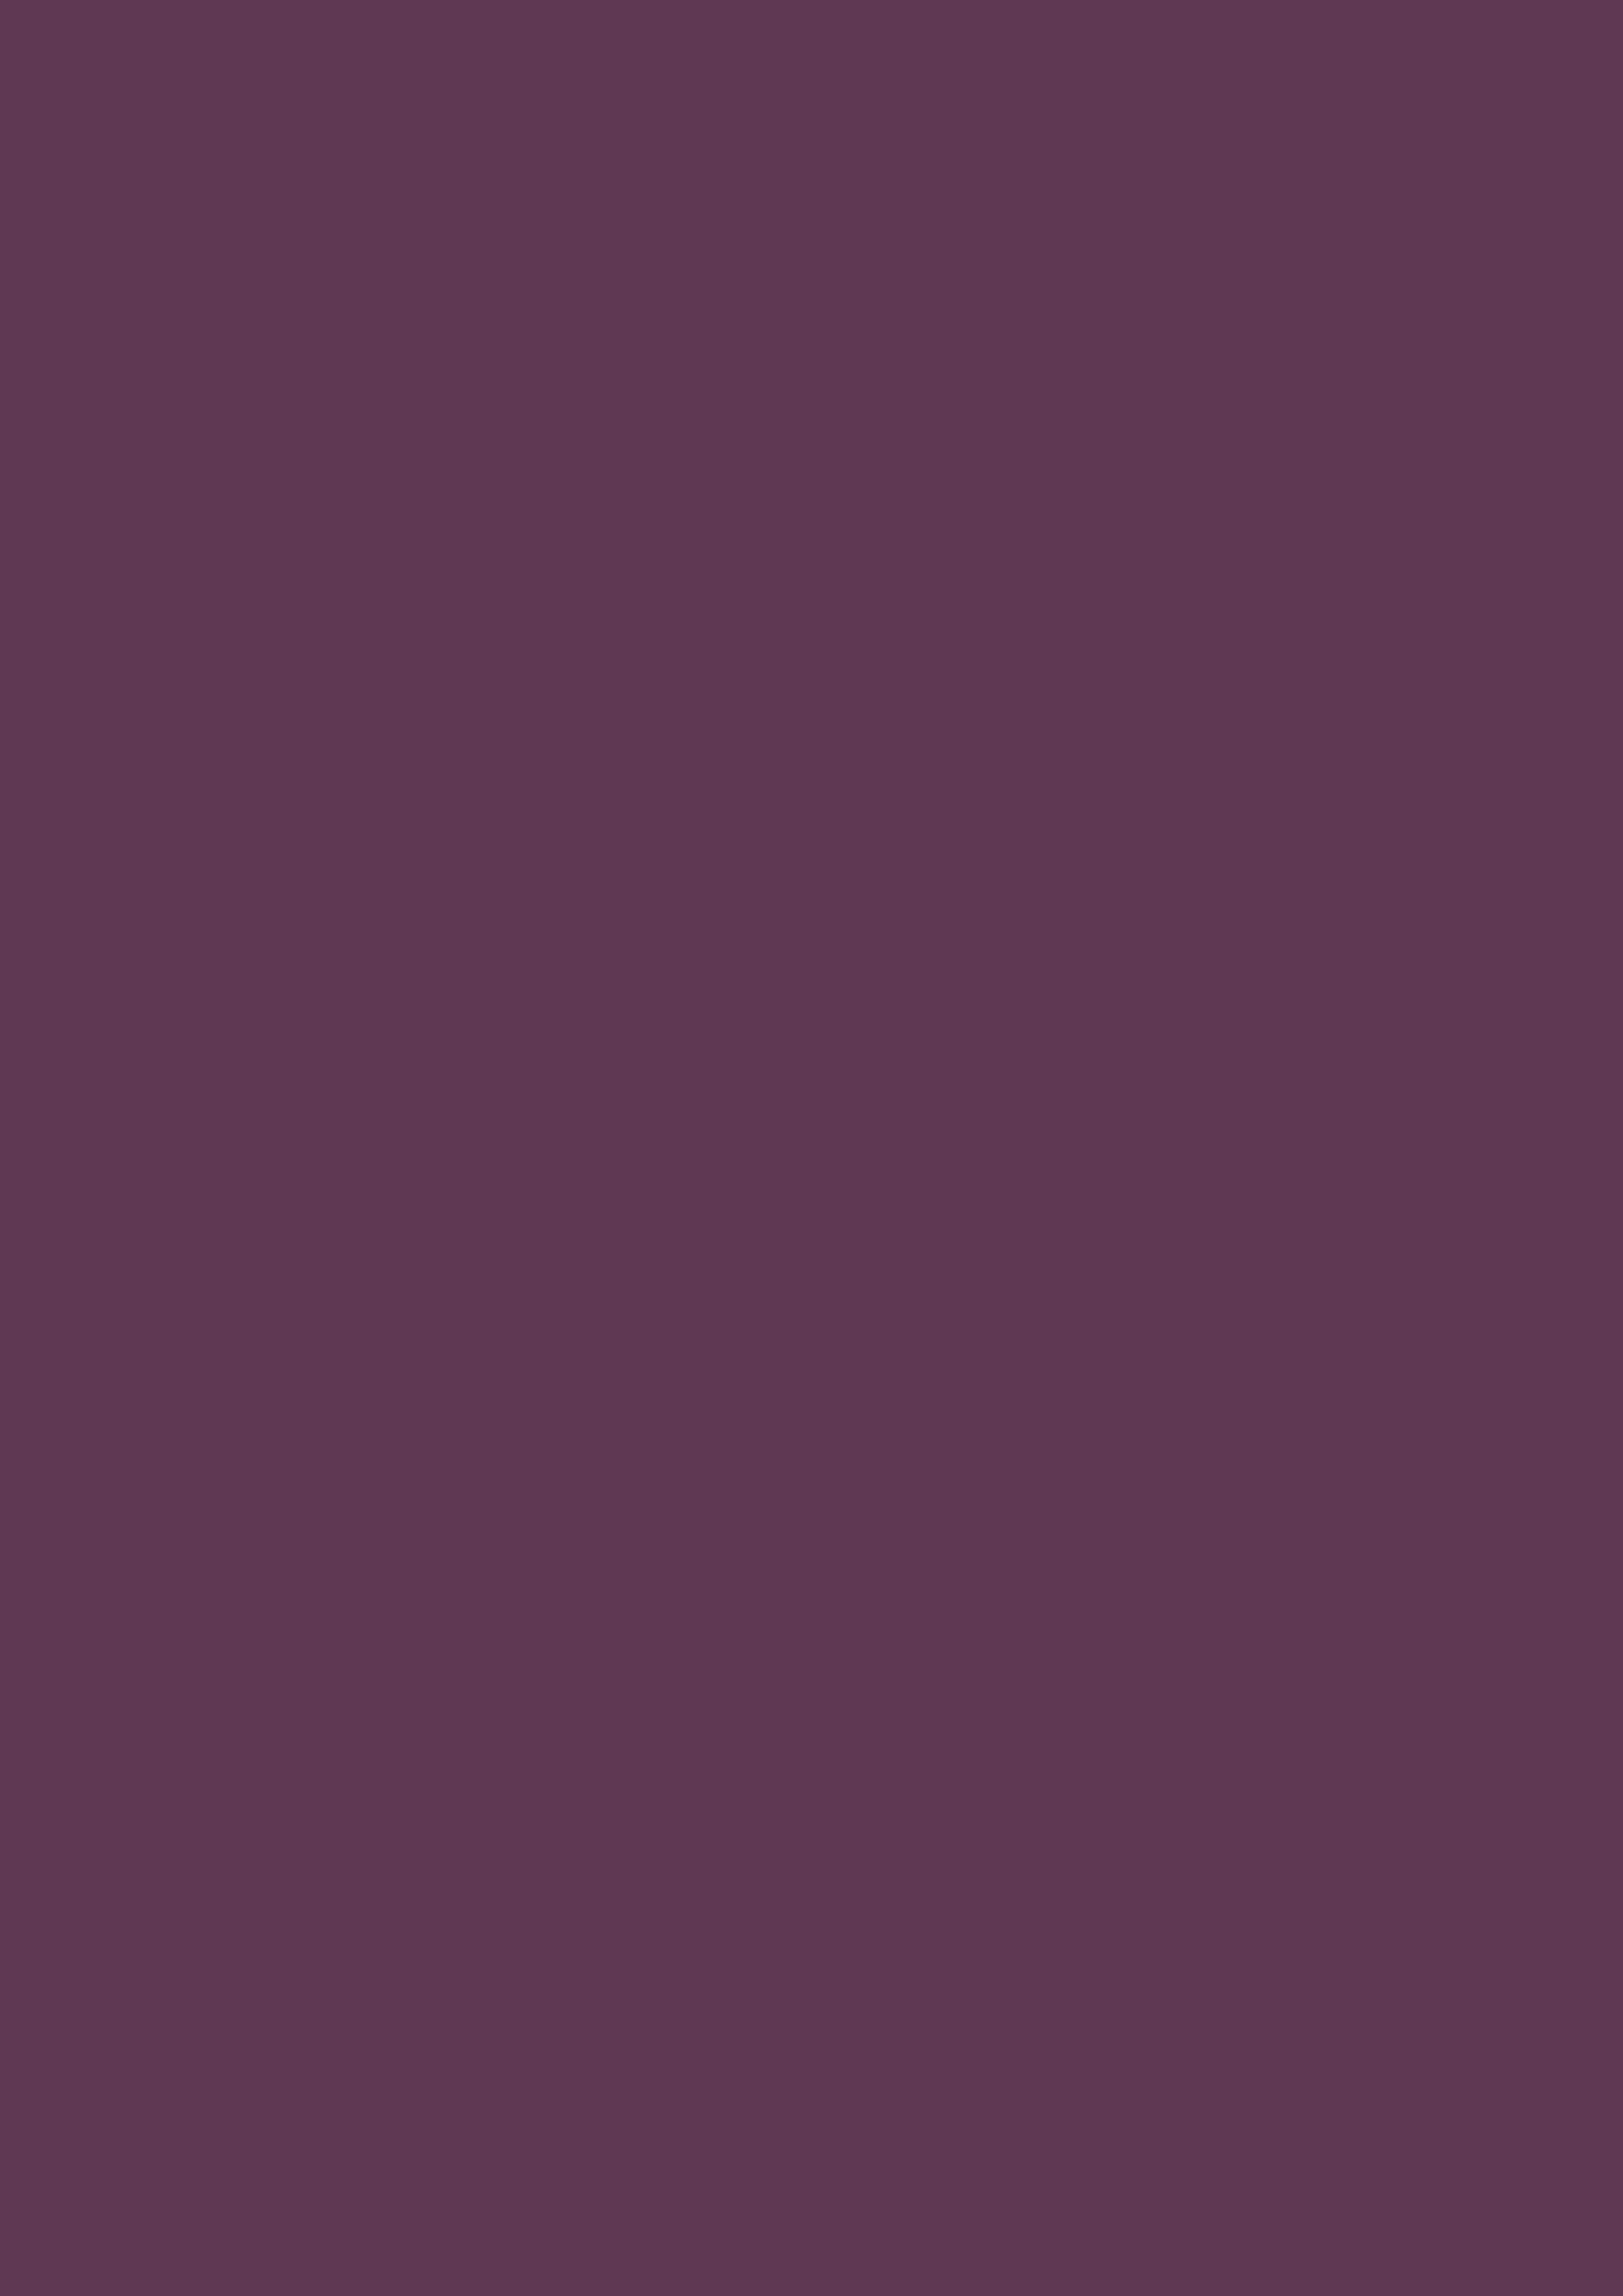 2480x3508 Dark Byzantium Solid Color Background